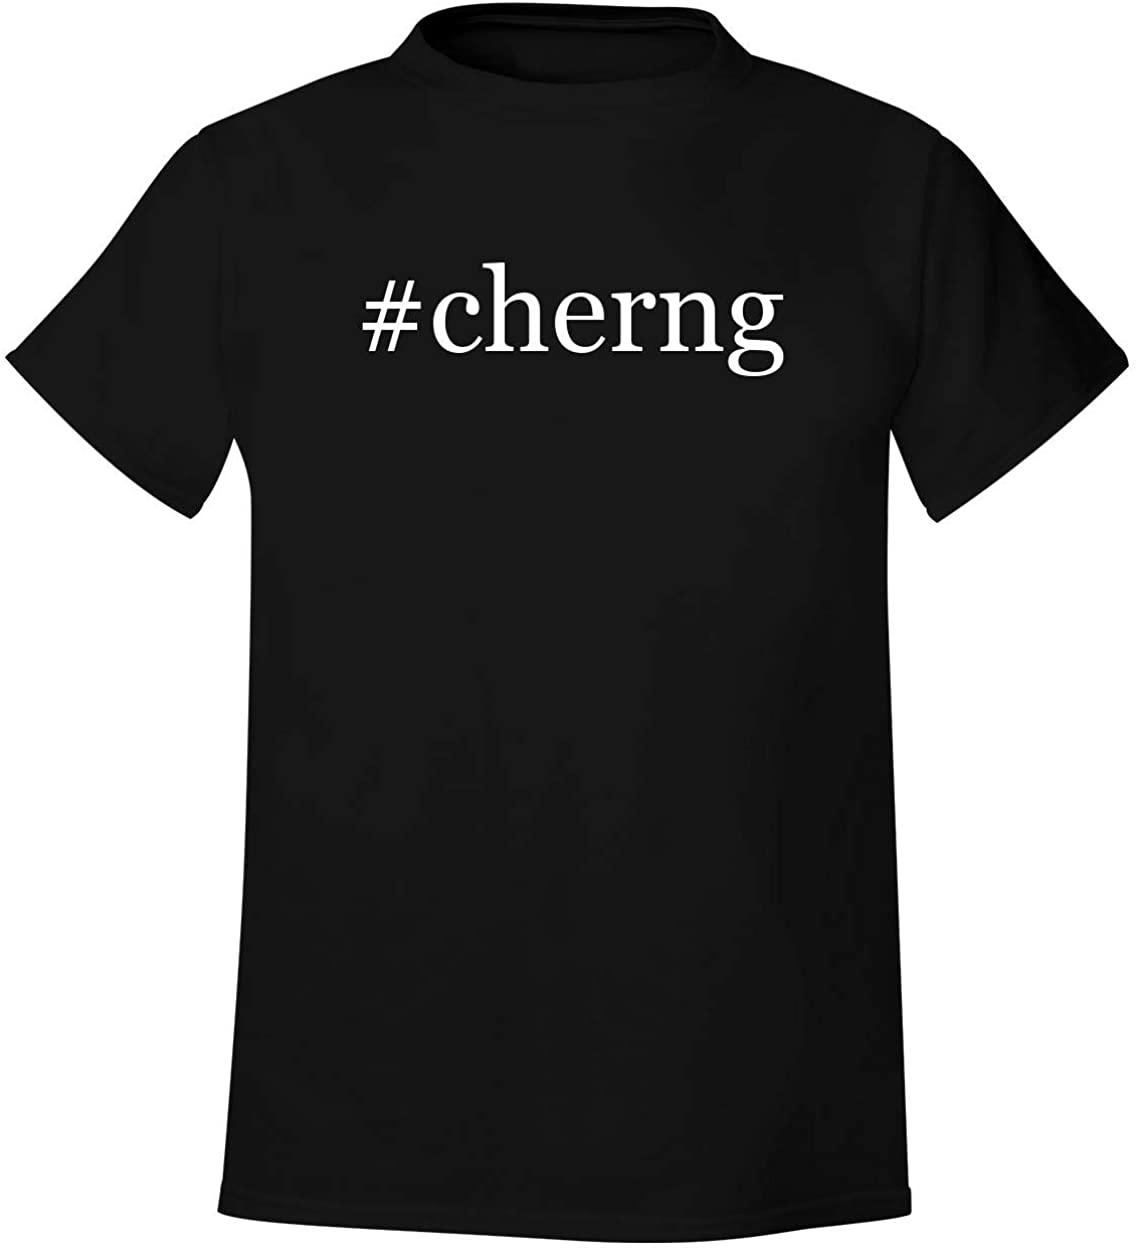 #cherng - Men's Hashtag Soft & Comfortable T-Shirt